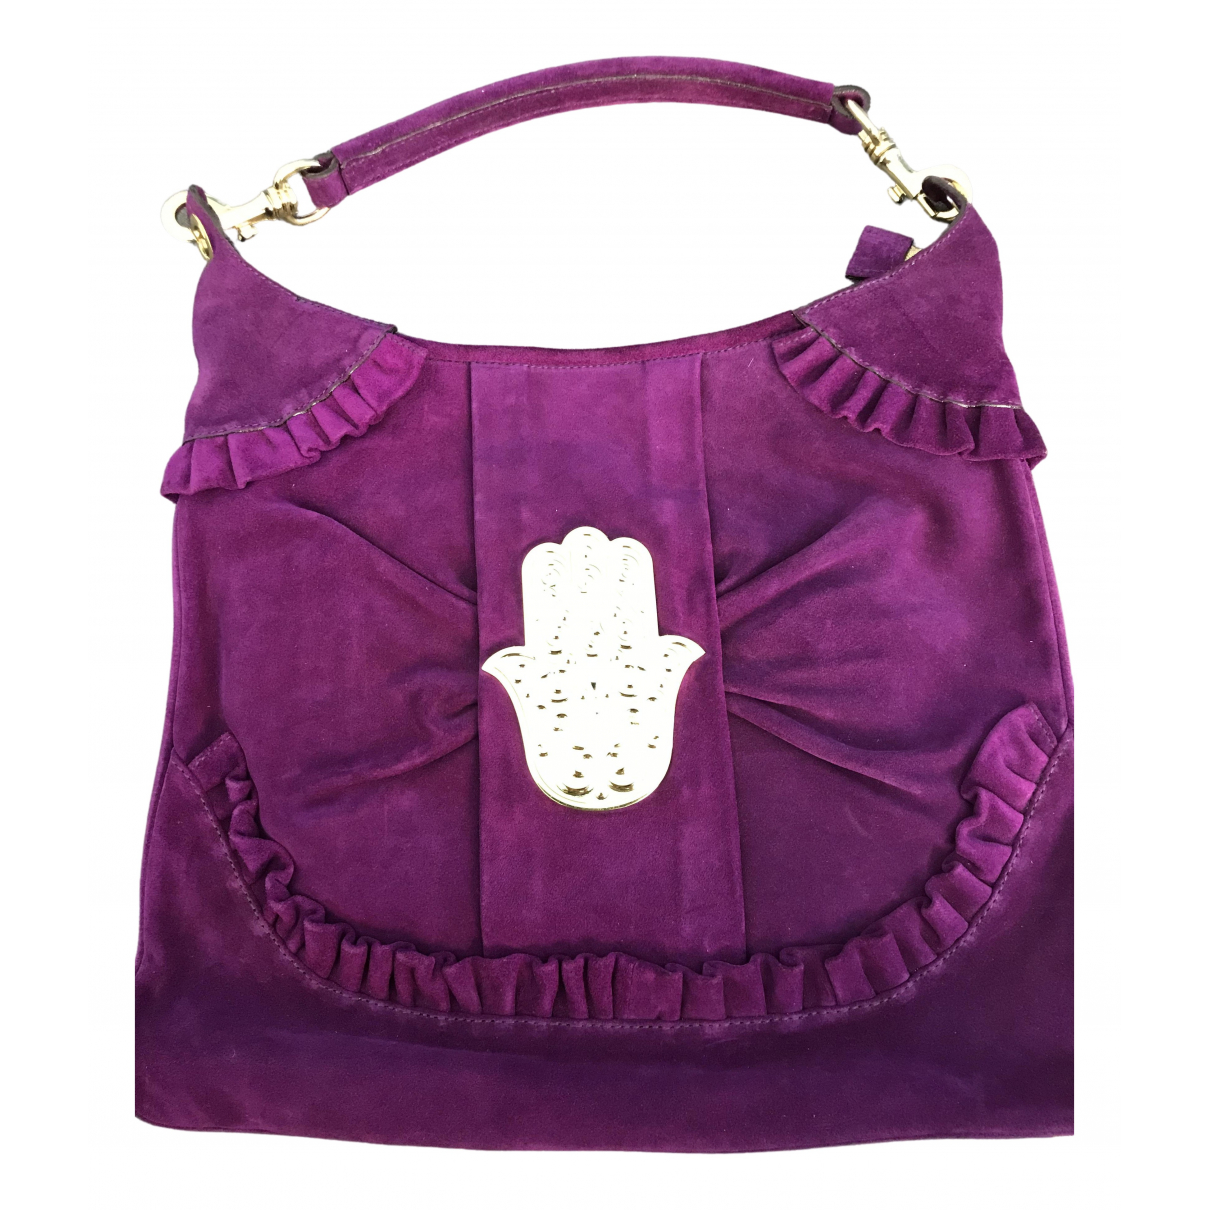 Manoush \N Handtasche in  Lila Leder